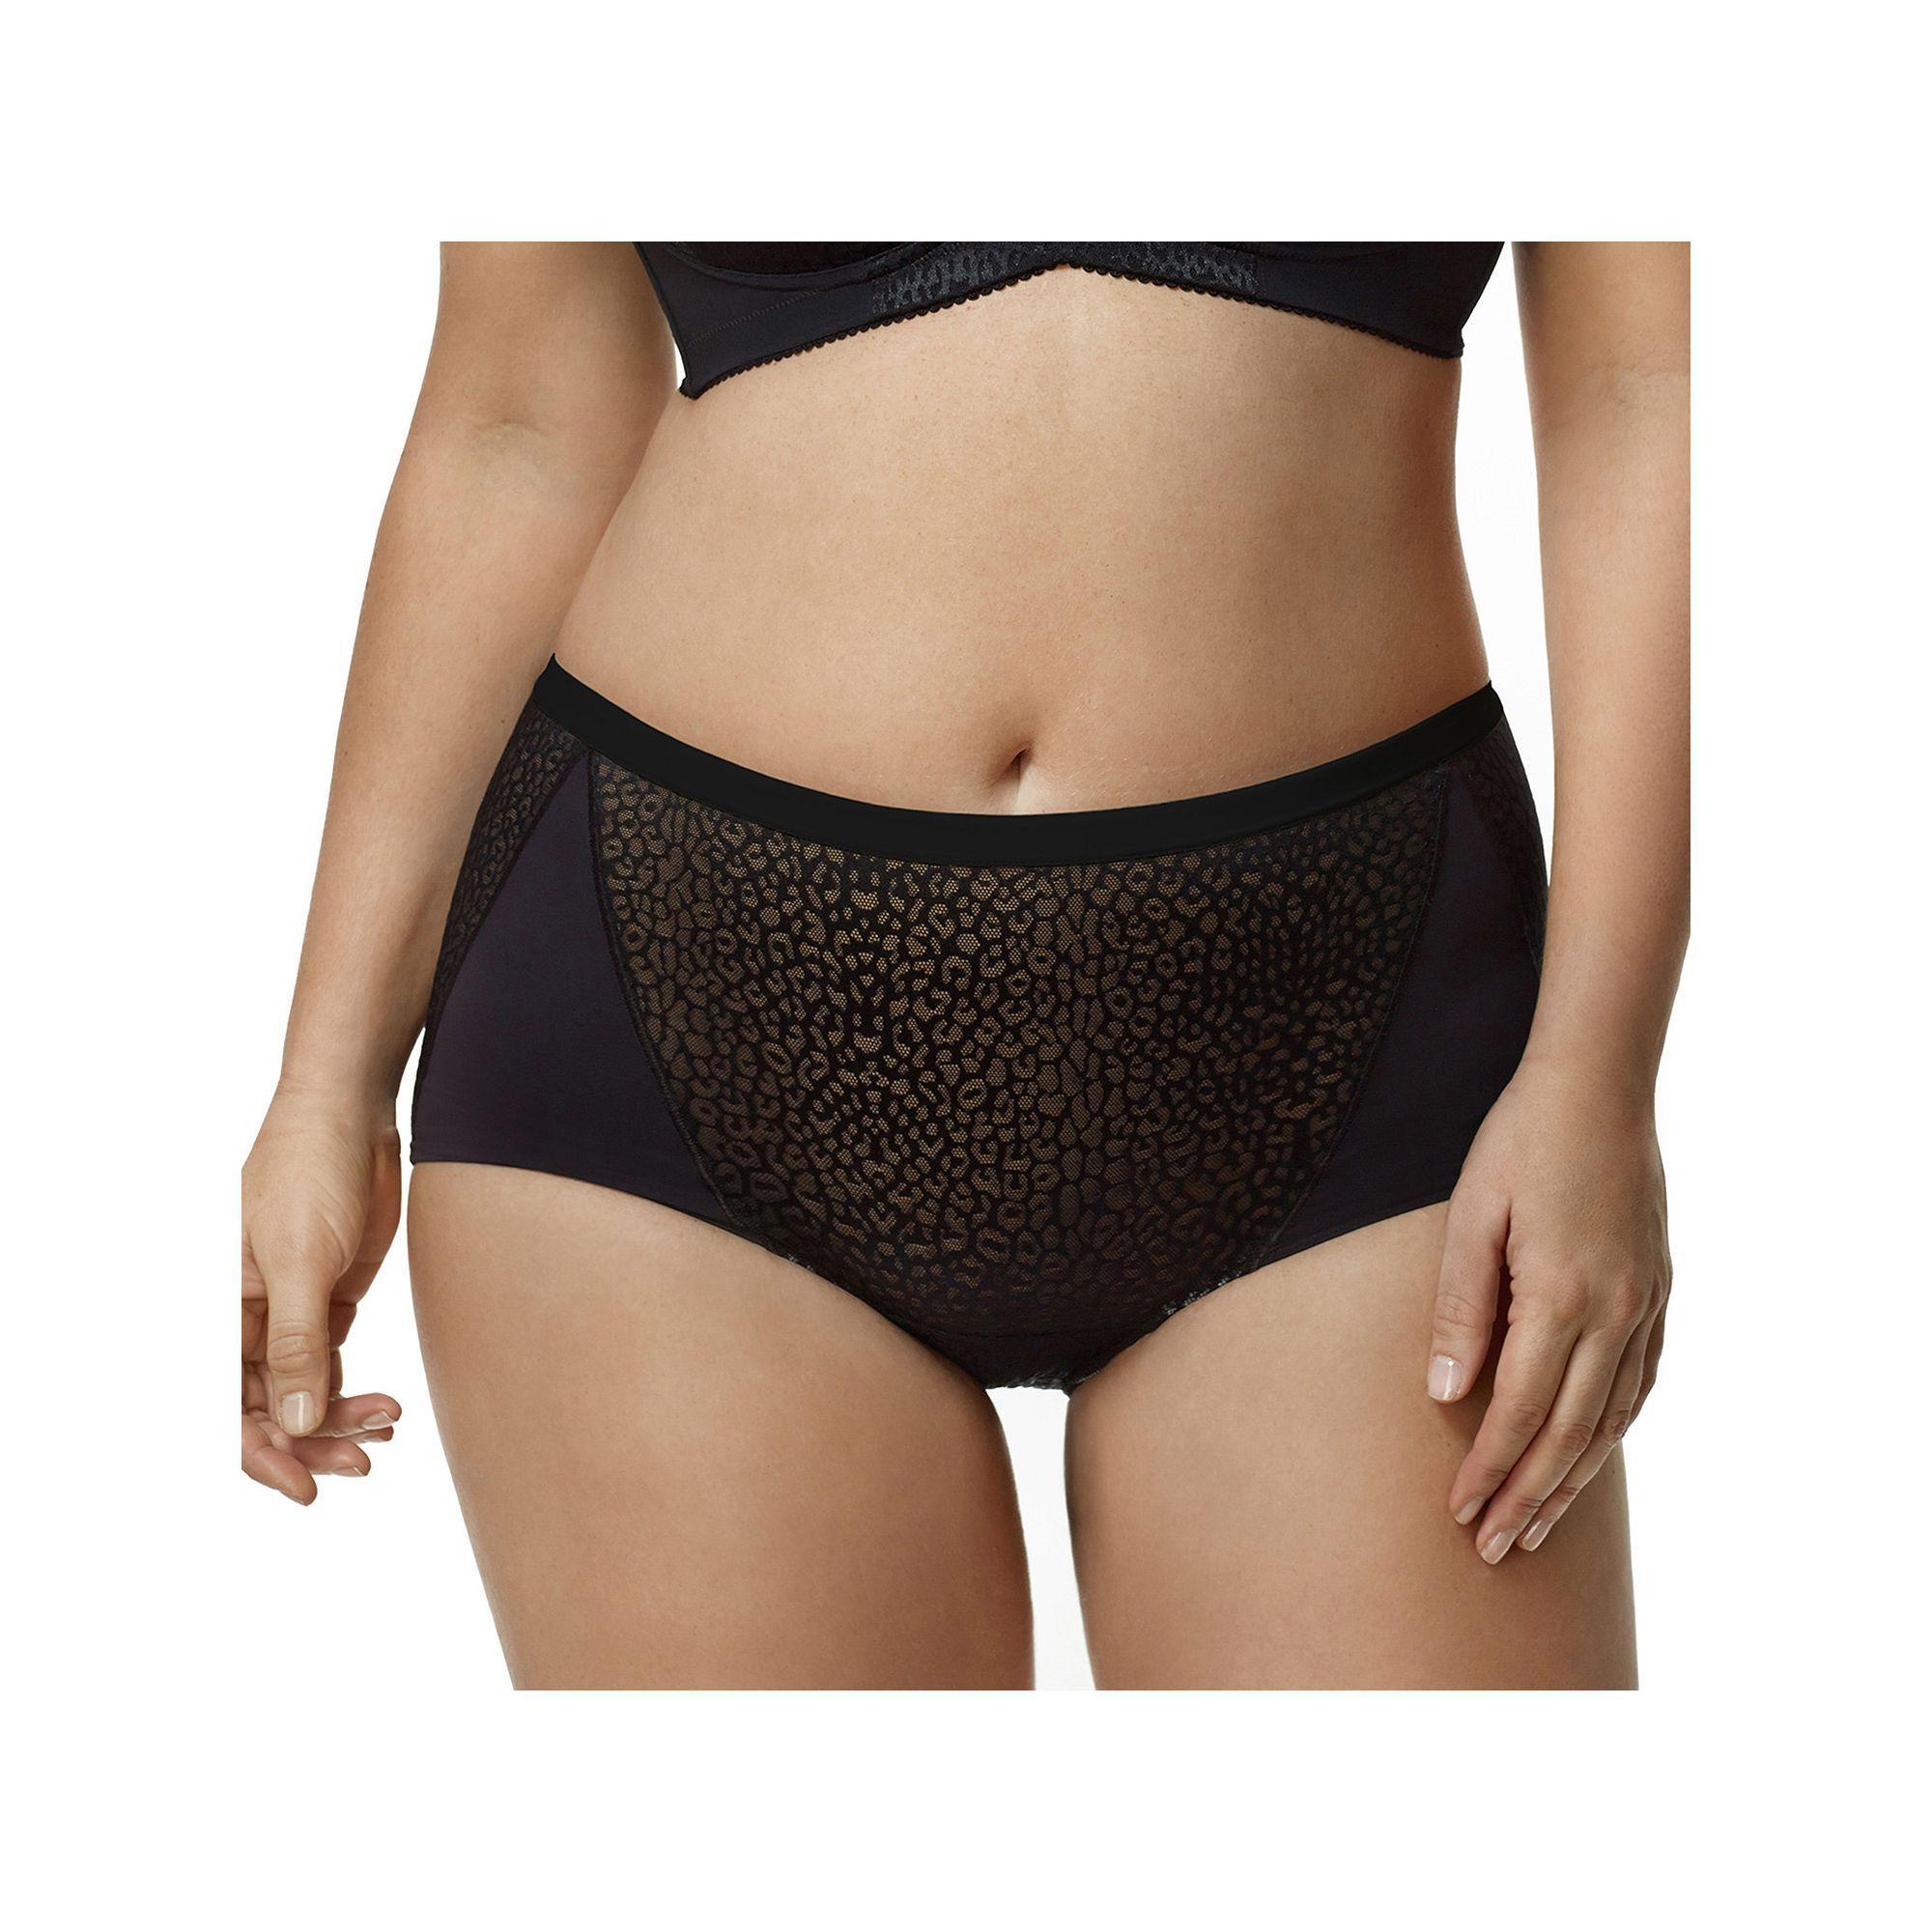 Plus Size Elila Leopard Microfiber Brief Panty 3201, Women's, Size: 5XL,  Beige Oth